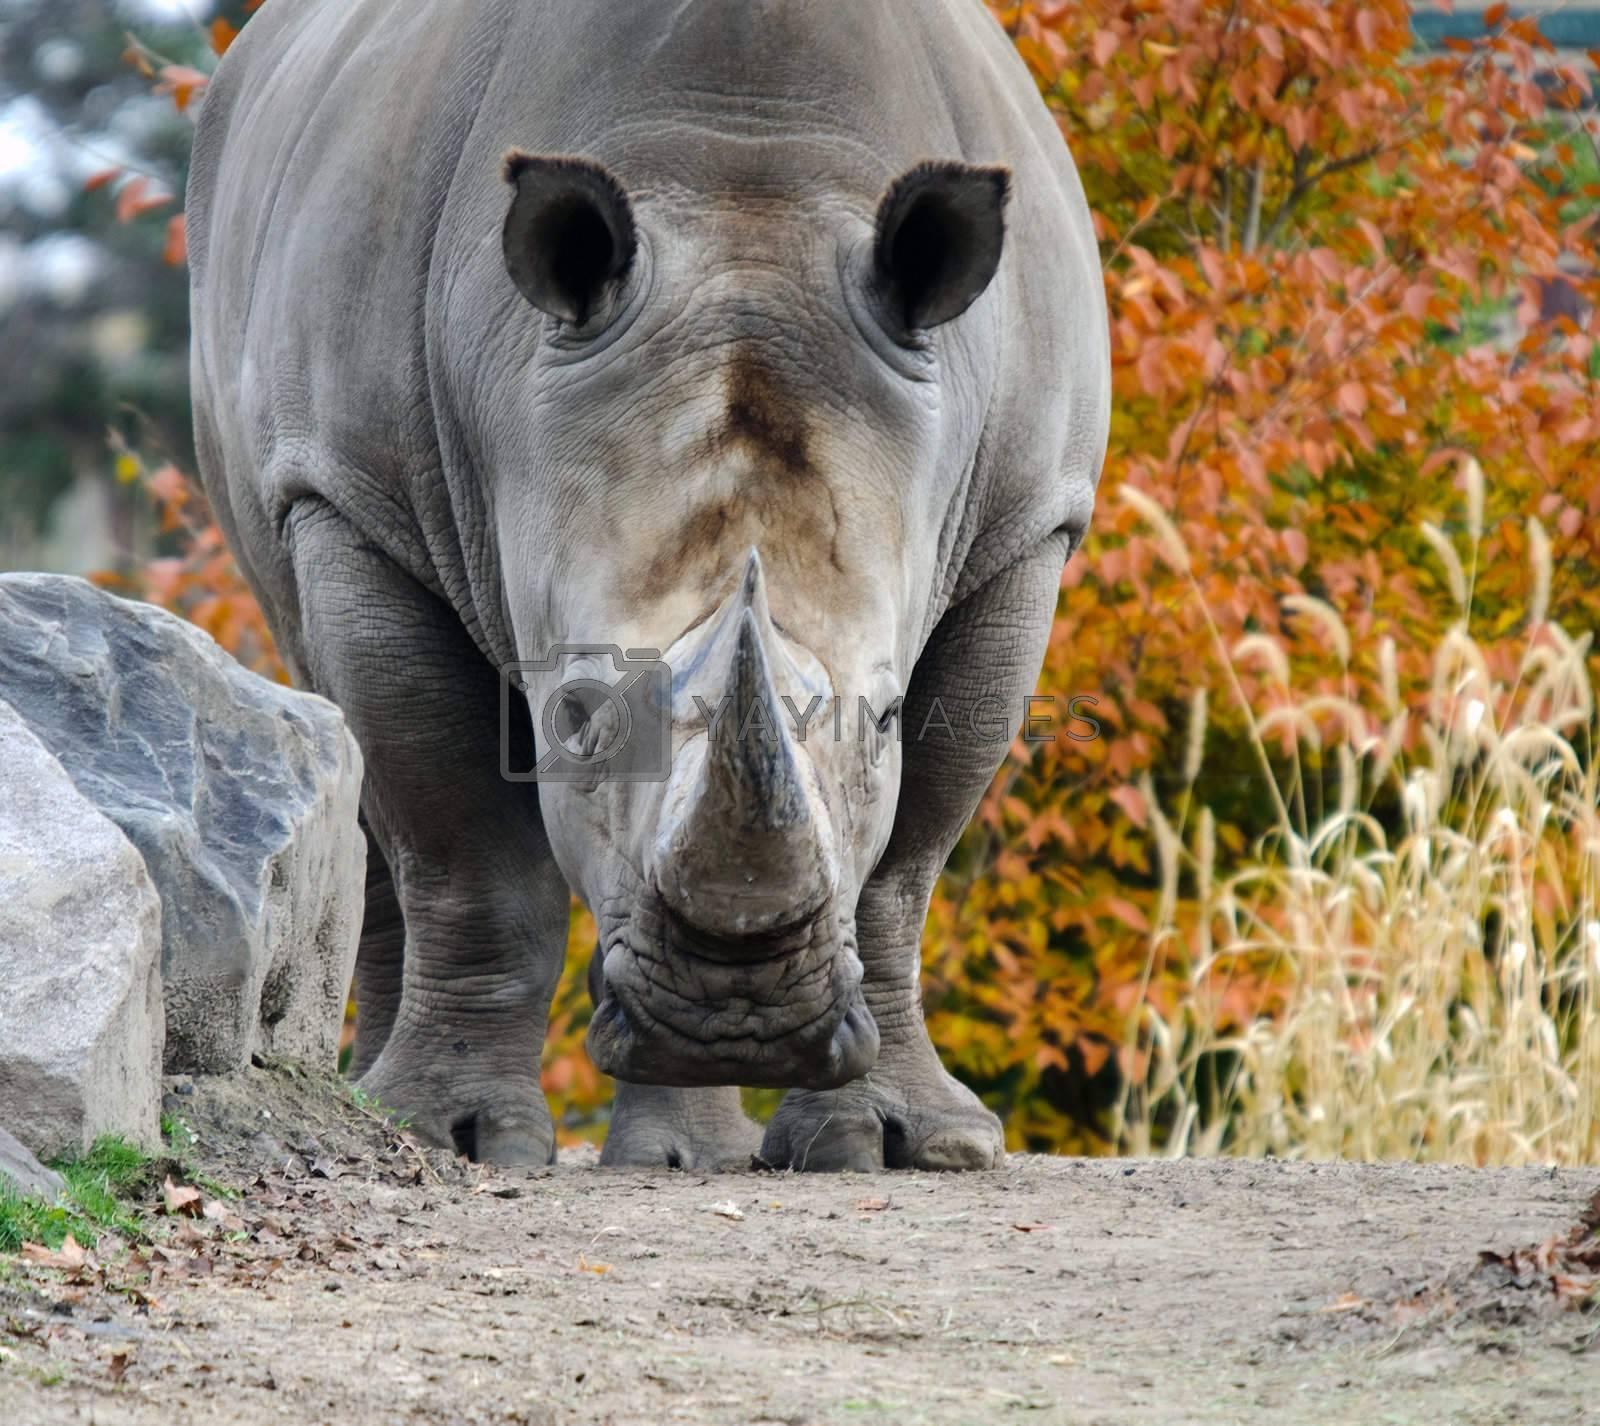 Royalty free image of Rhino by nialat